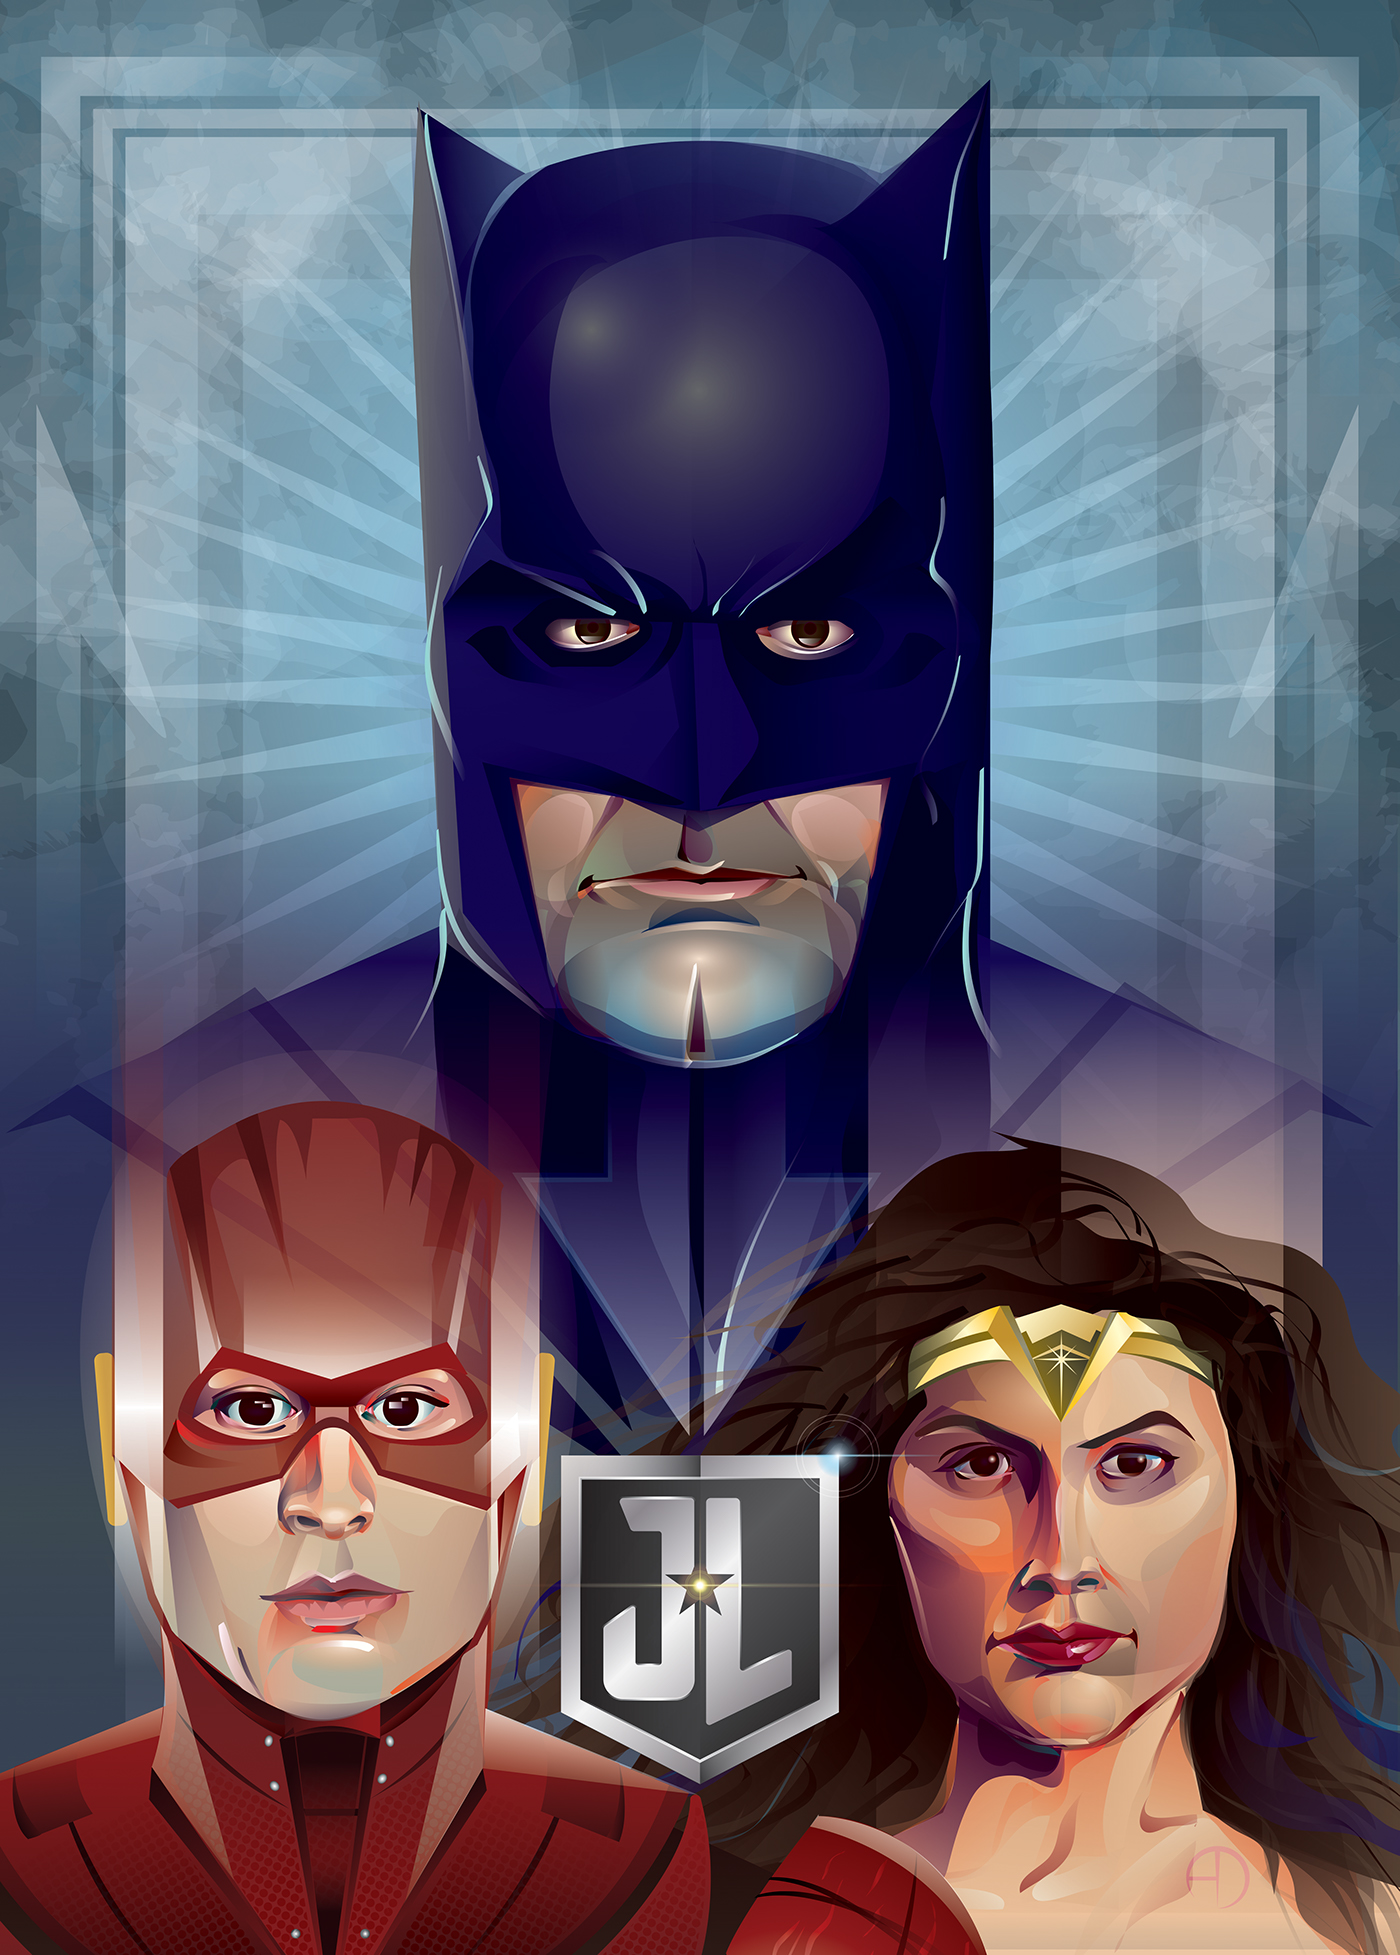 vector vectorart vectordesign printdesign print poster PosterArt dccomics comic movieposter